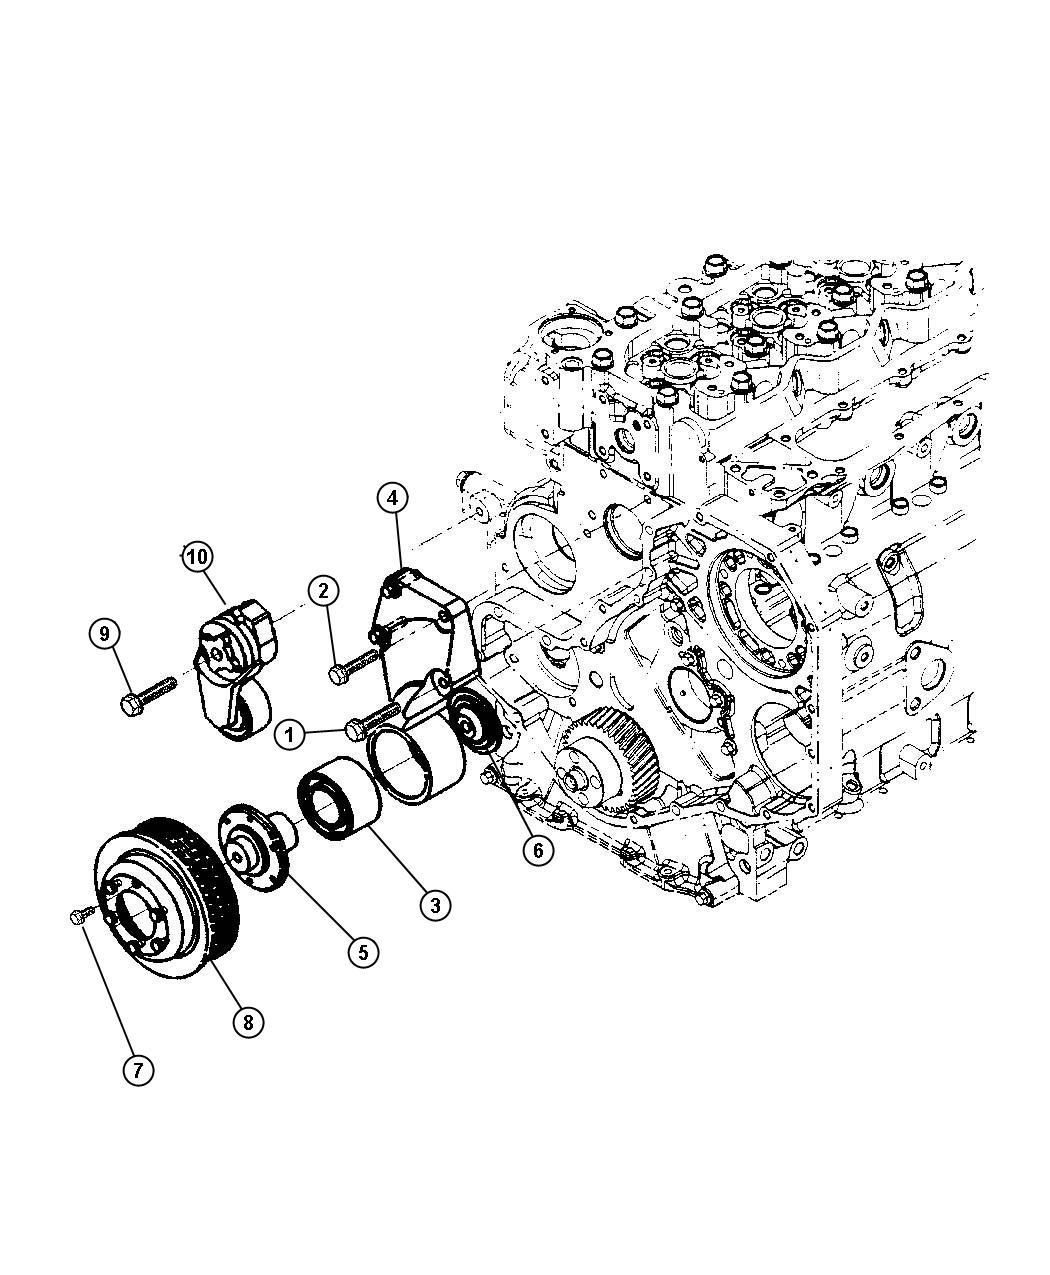 Dodge Ram Bolt Screw Hex Flange Head M6x1